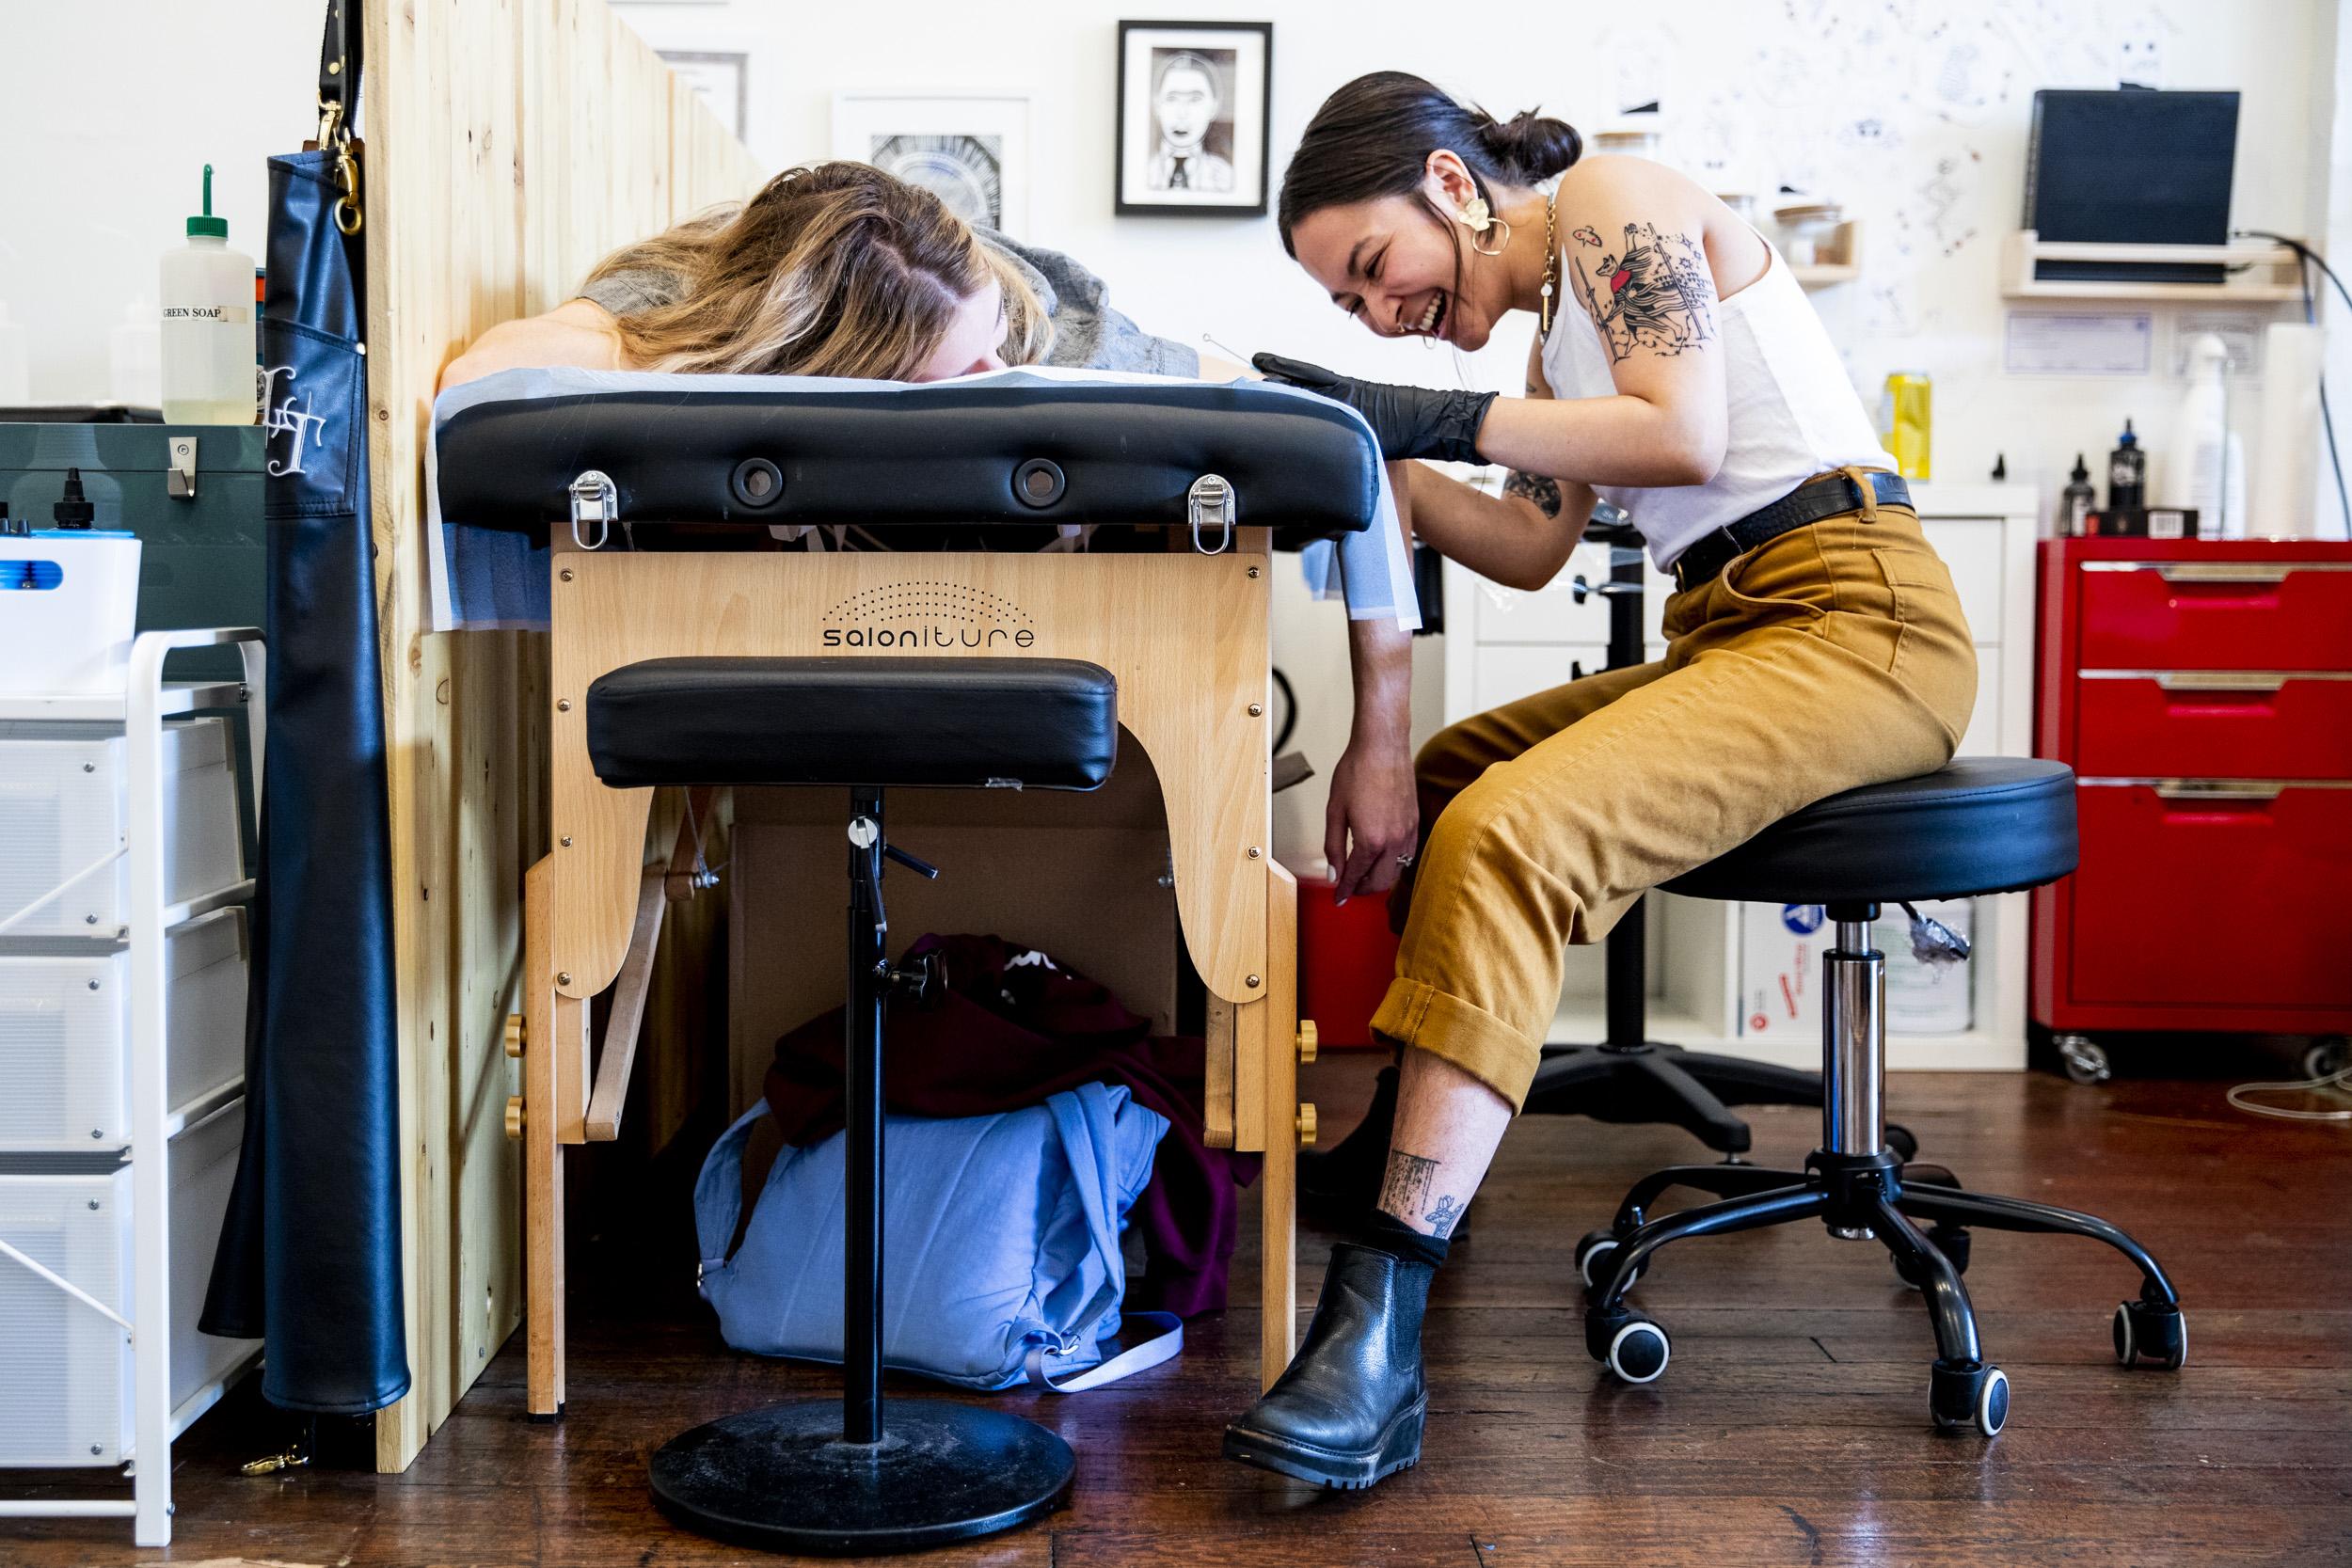 Tattoo artist Avery Osajima works on a client using the stick-and-poke method